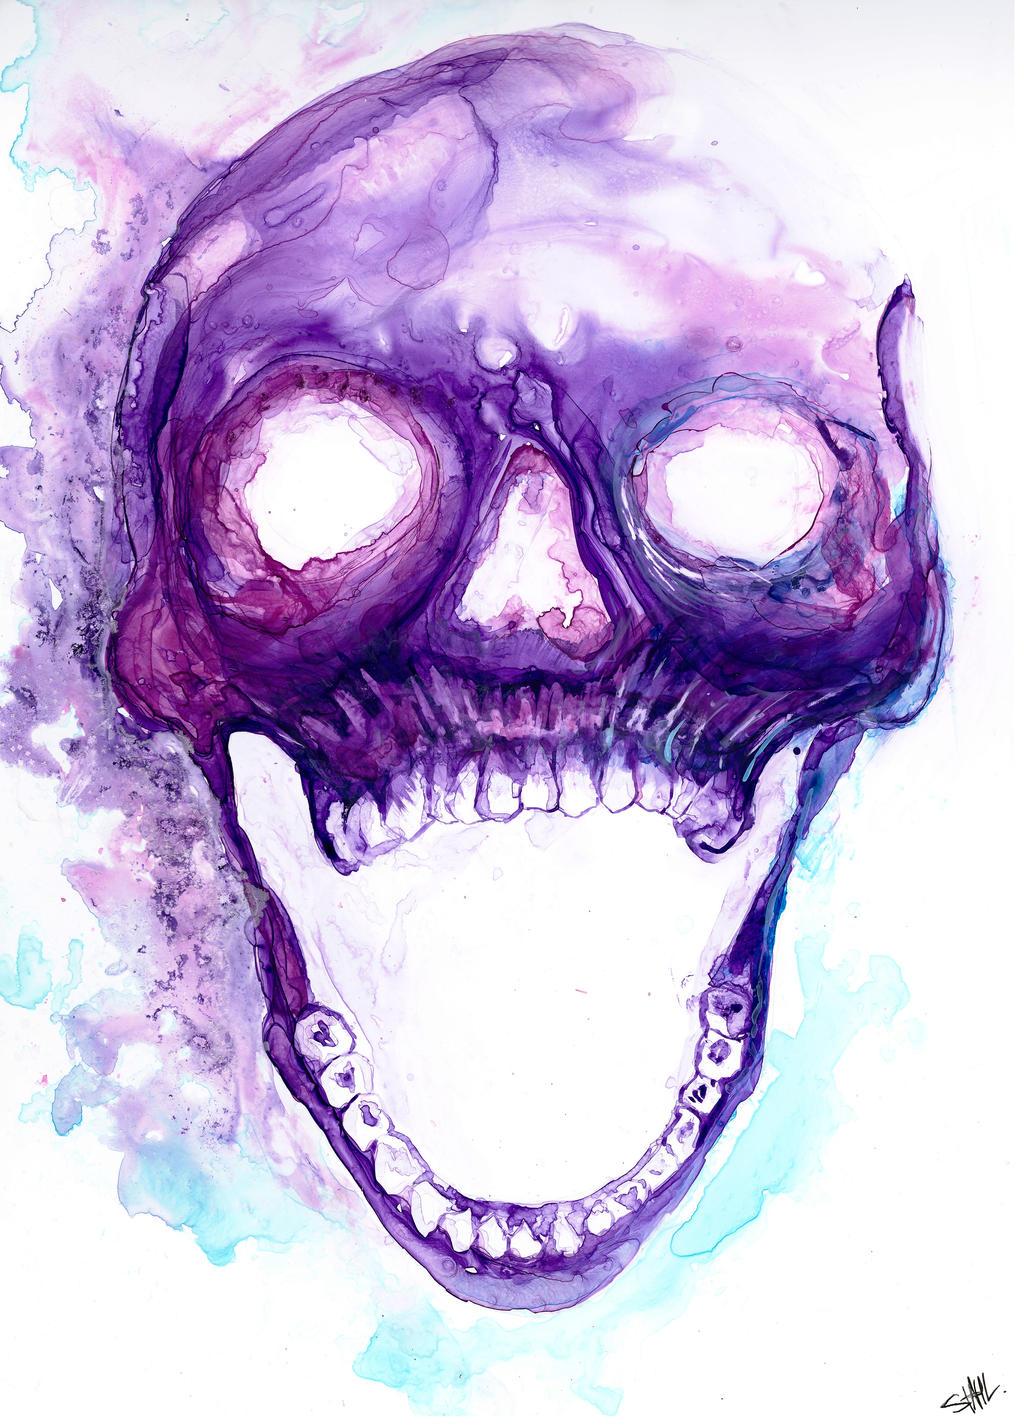 Purple Skull by clement-stahl on DeviantArt